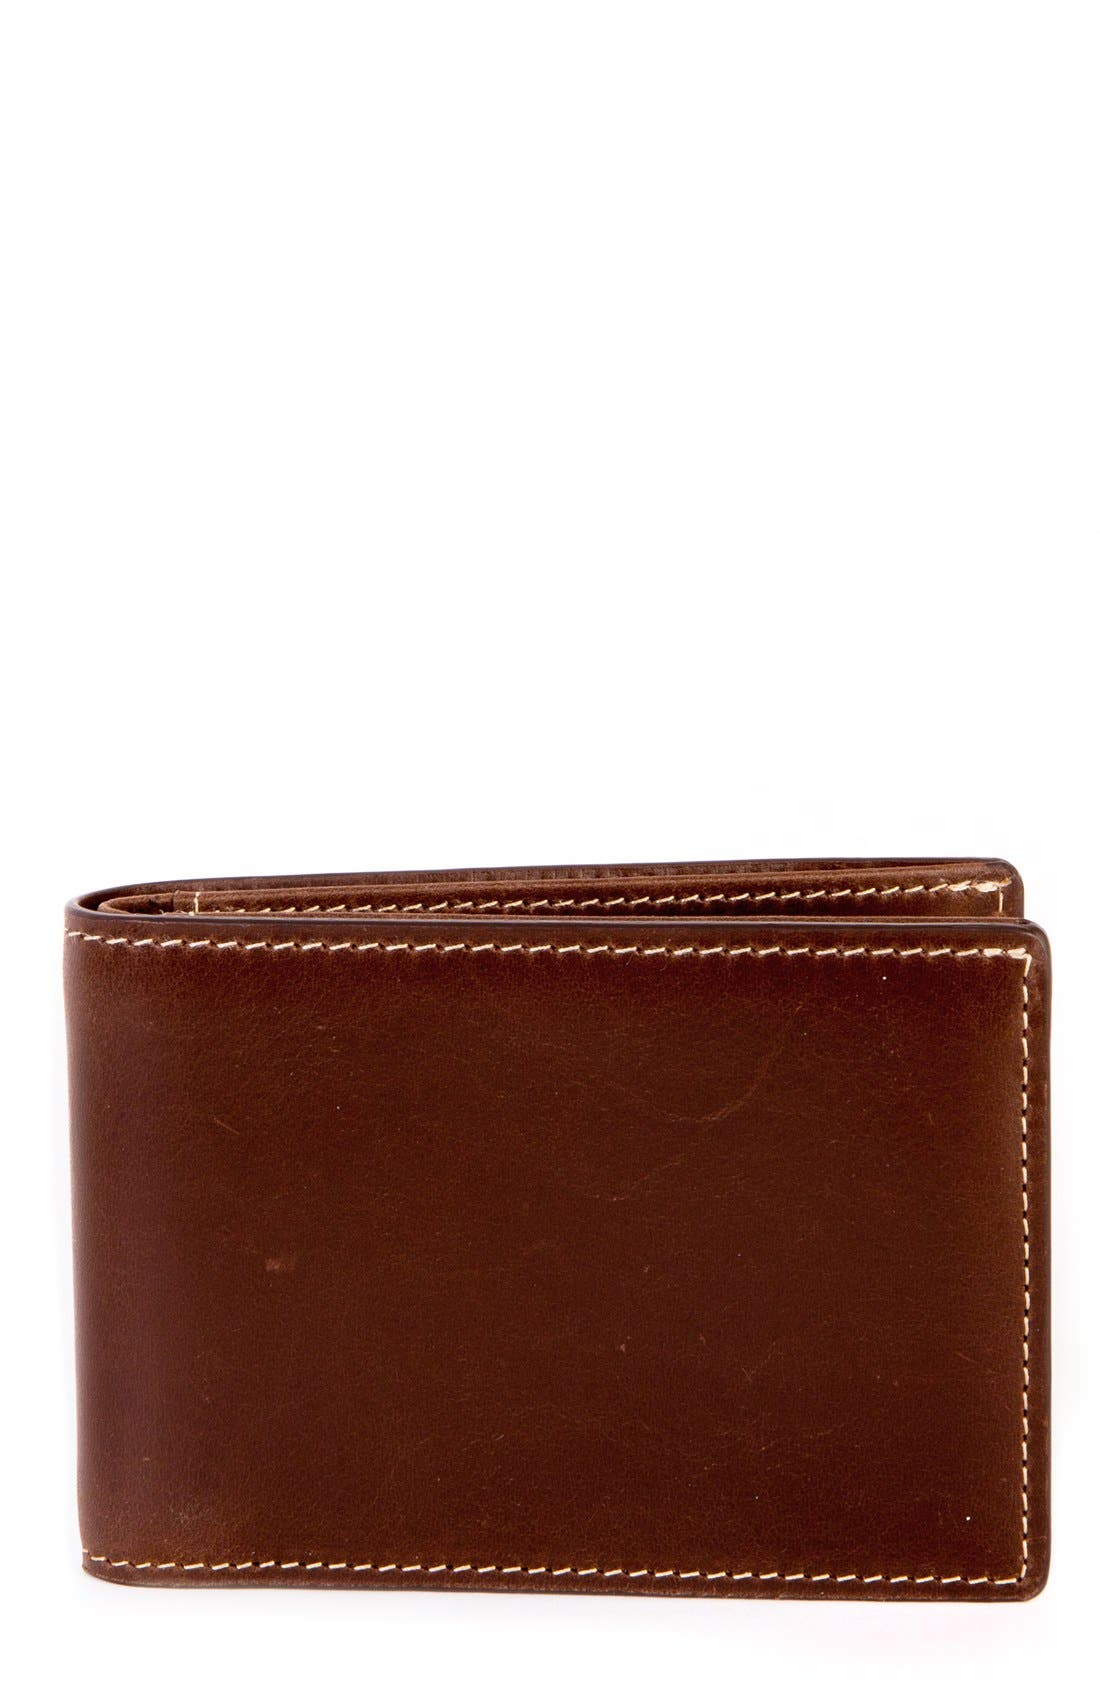 Boconi 'Bryant' Leather RFID Wallet